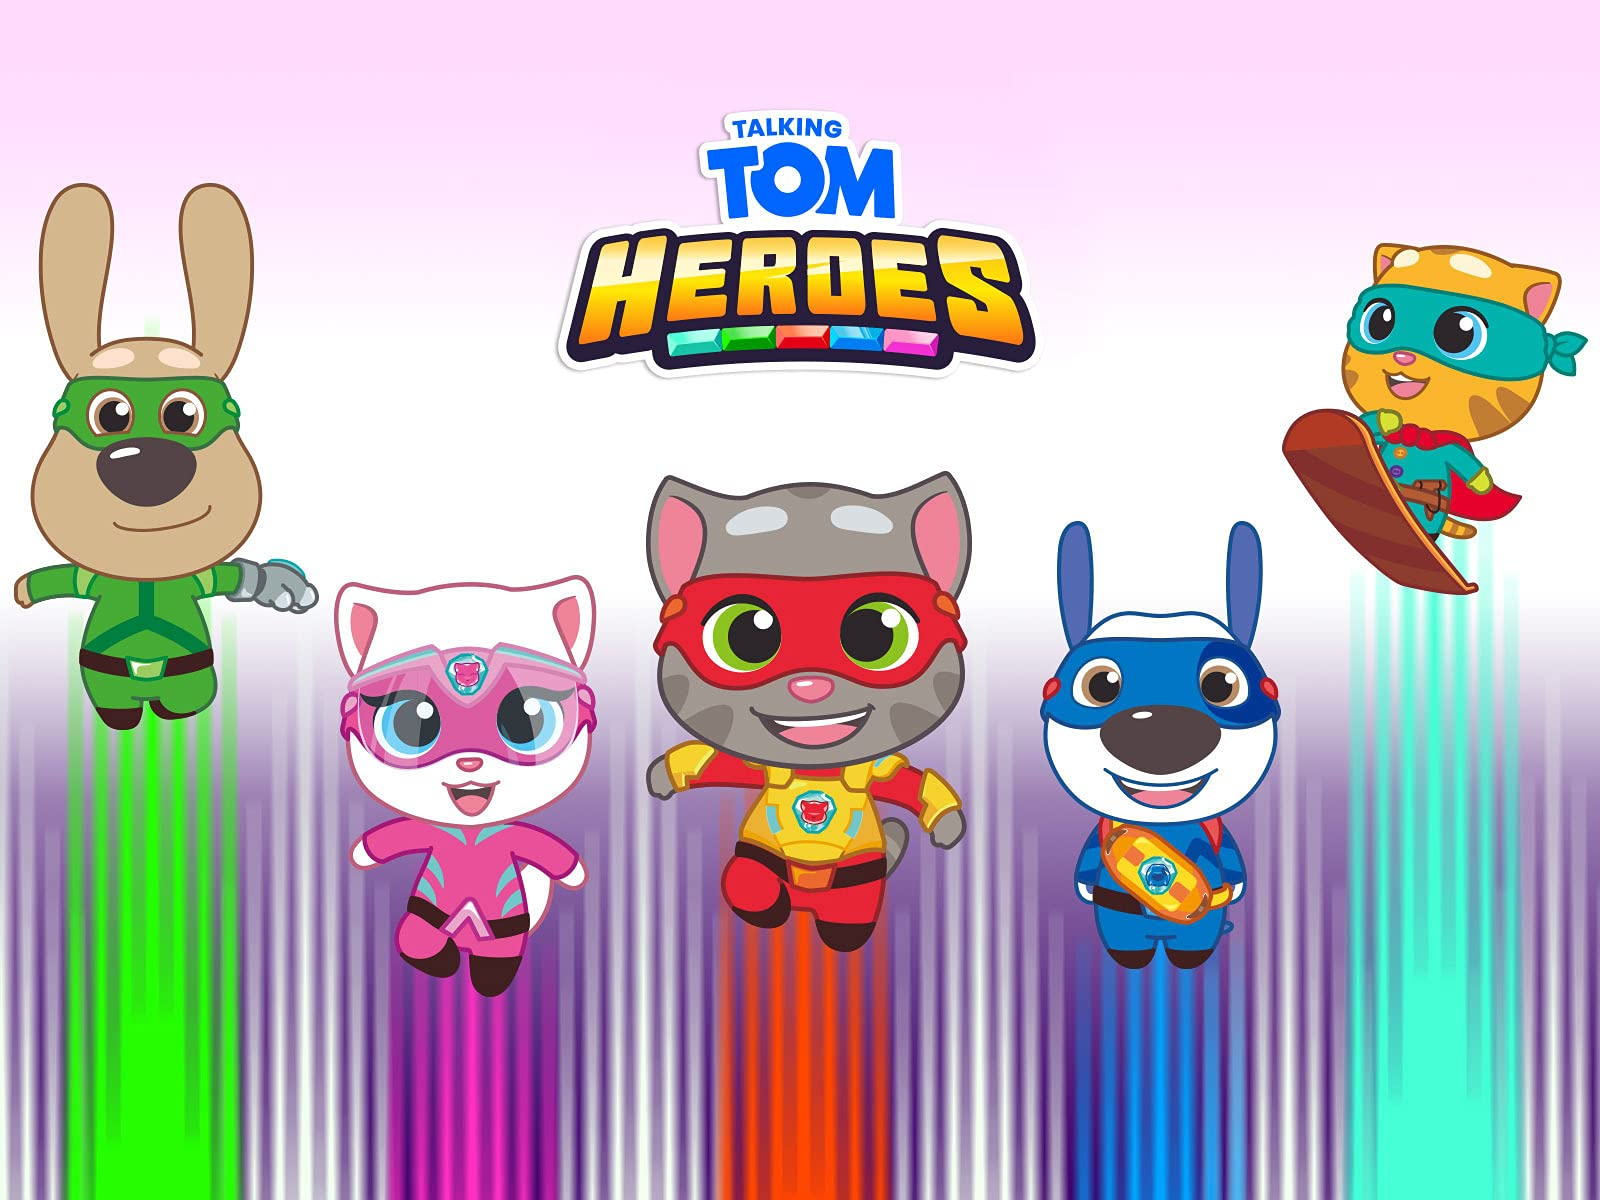 Amazon.de Talking Tom Heroes ansehen   Prime Video